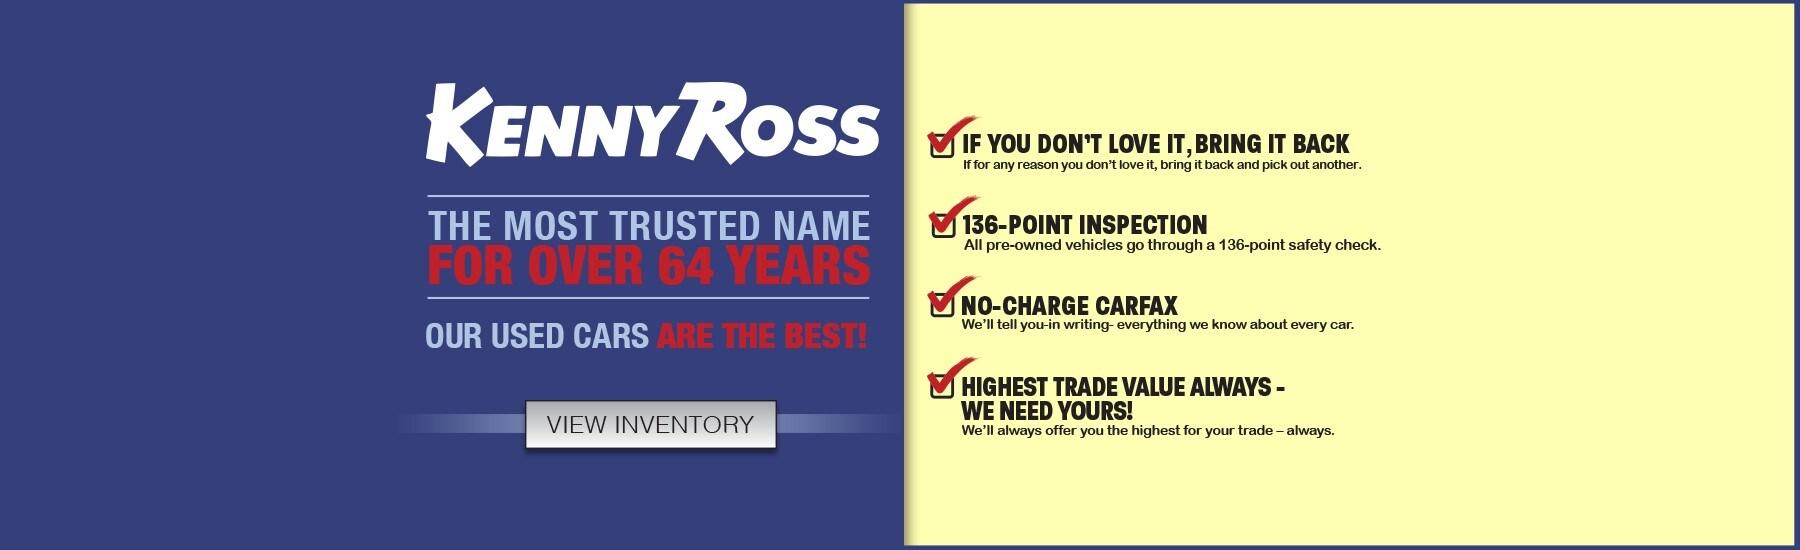 Kenny Ross Subaru Service >> Kenny Ross Subaru | Subaru Sales in North Huntingdon Township, PA